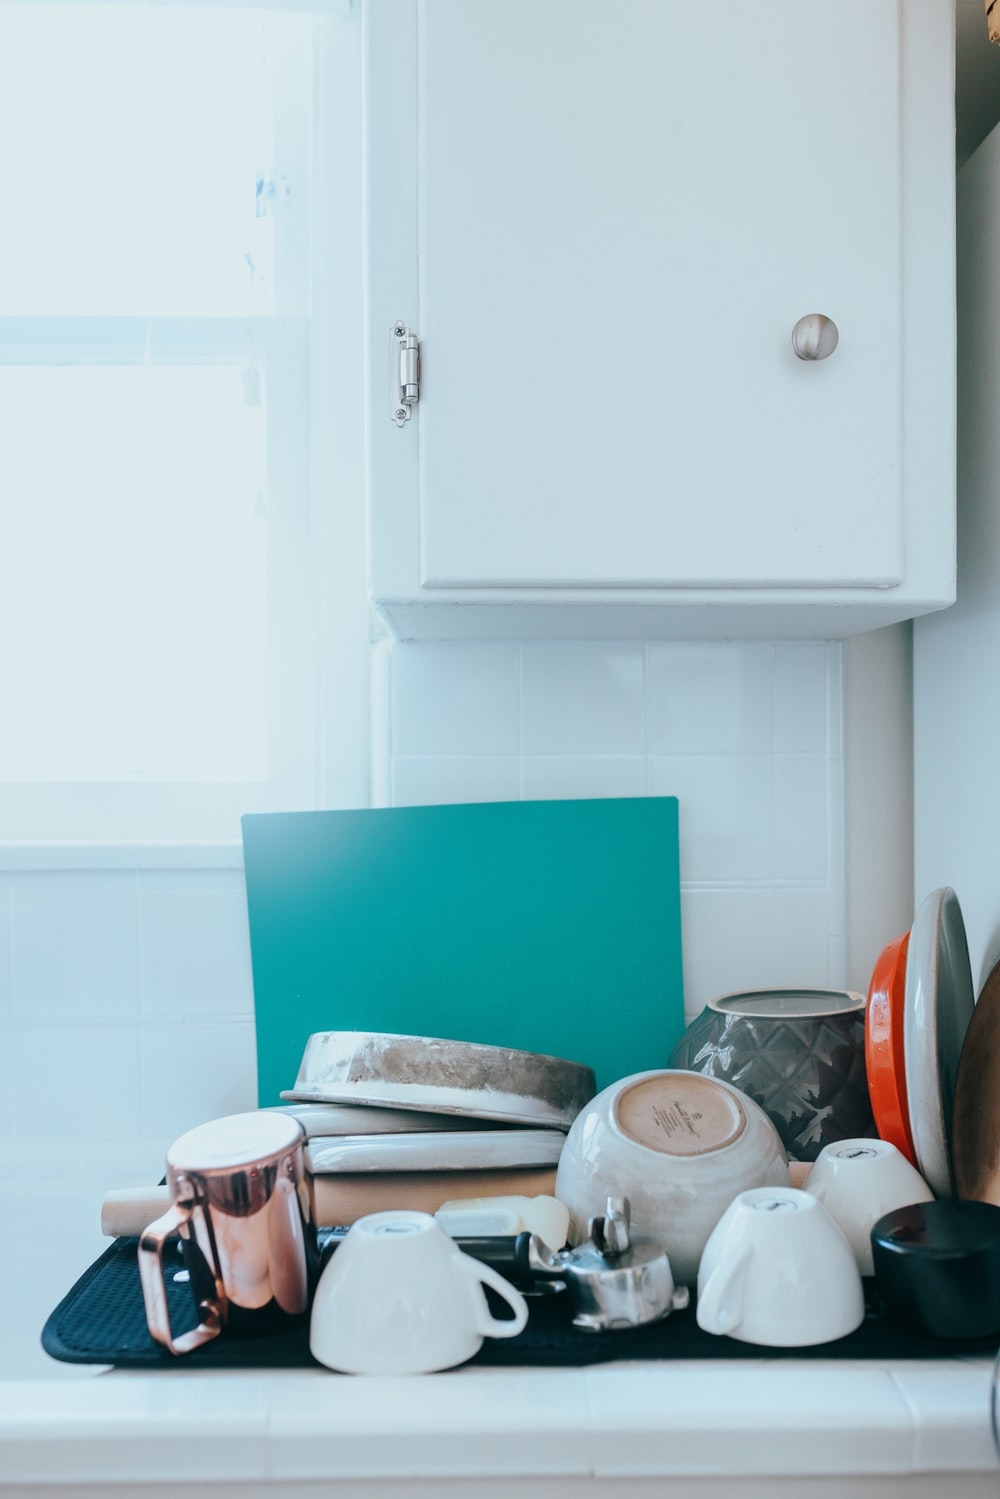 white wooden kitchen cabinet over white ceramic plate